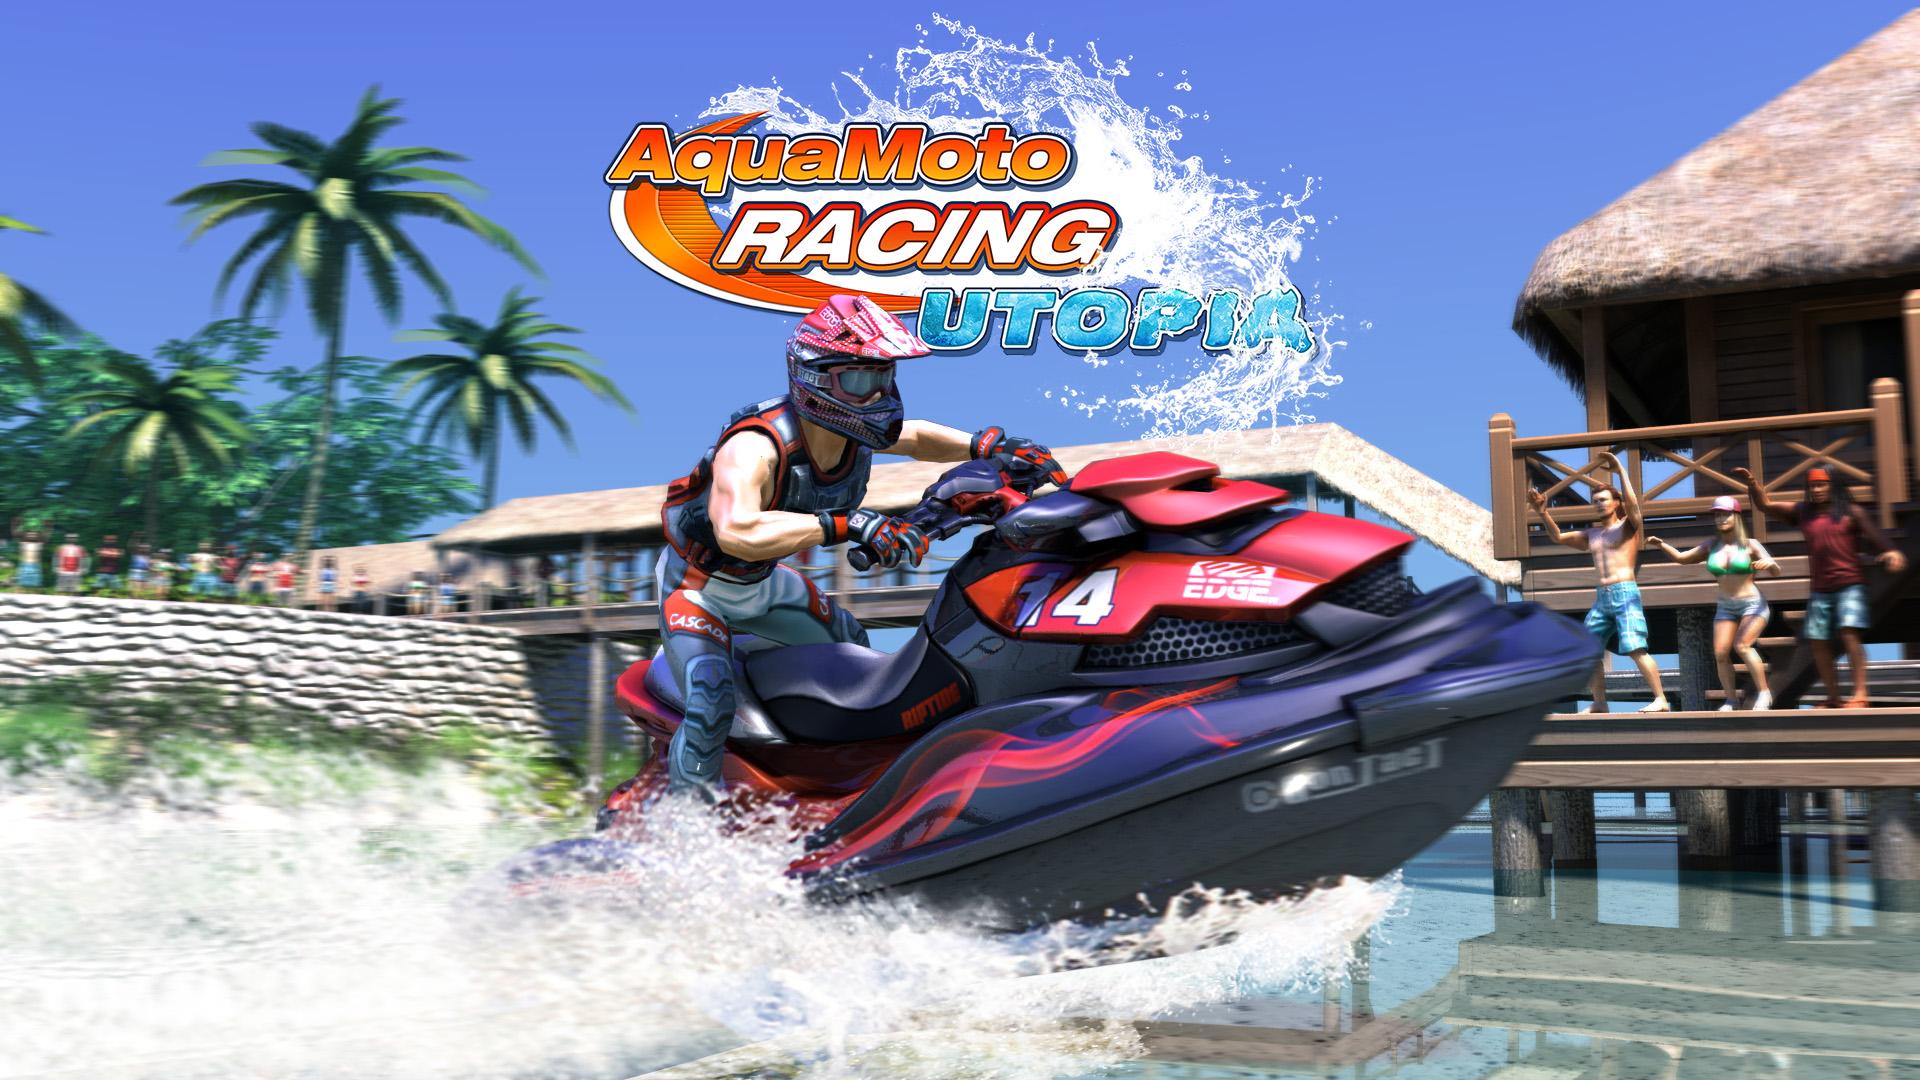 Aqua Moto Racing Utopia Preview Trailer